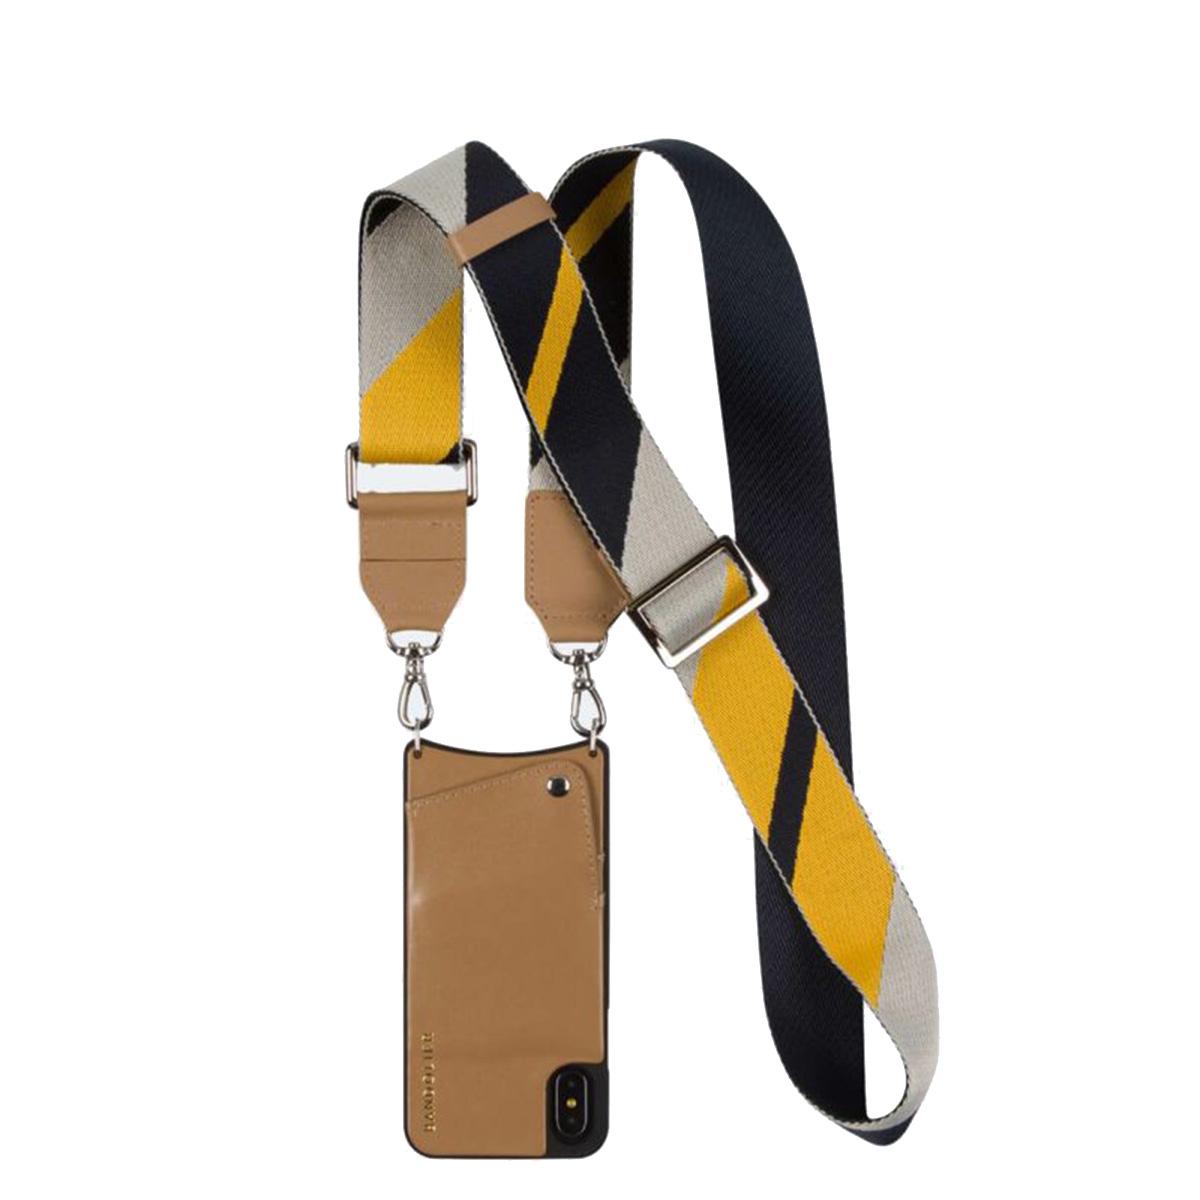 BANDOLIER iPhone SE SE2 8 7 6s 6 ケース スマホ 携帯 アイフォン レディース BELLA TAN NAVY キャメル 10bel